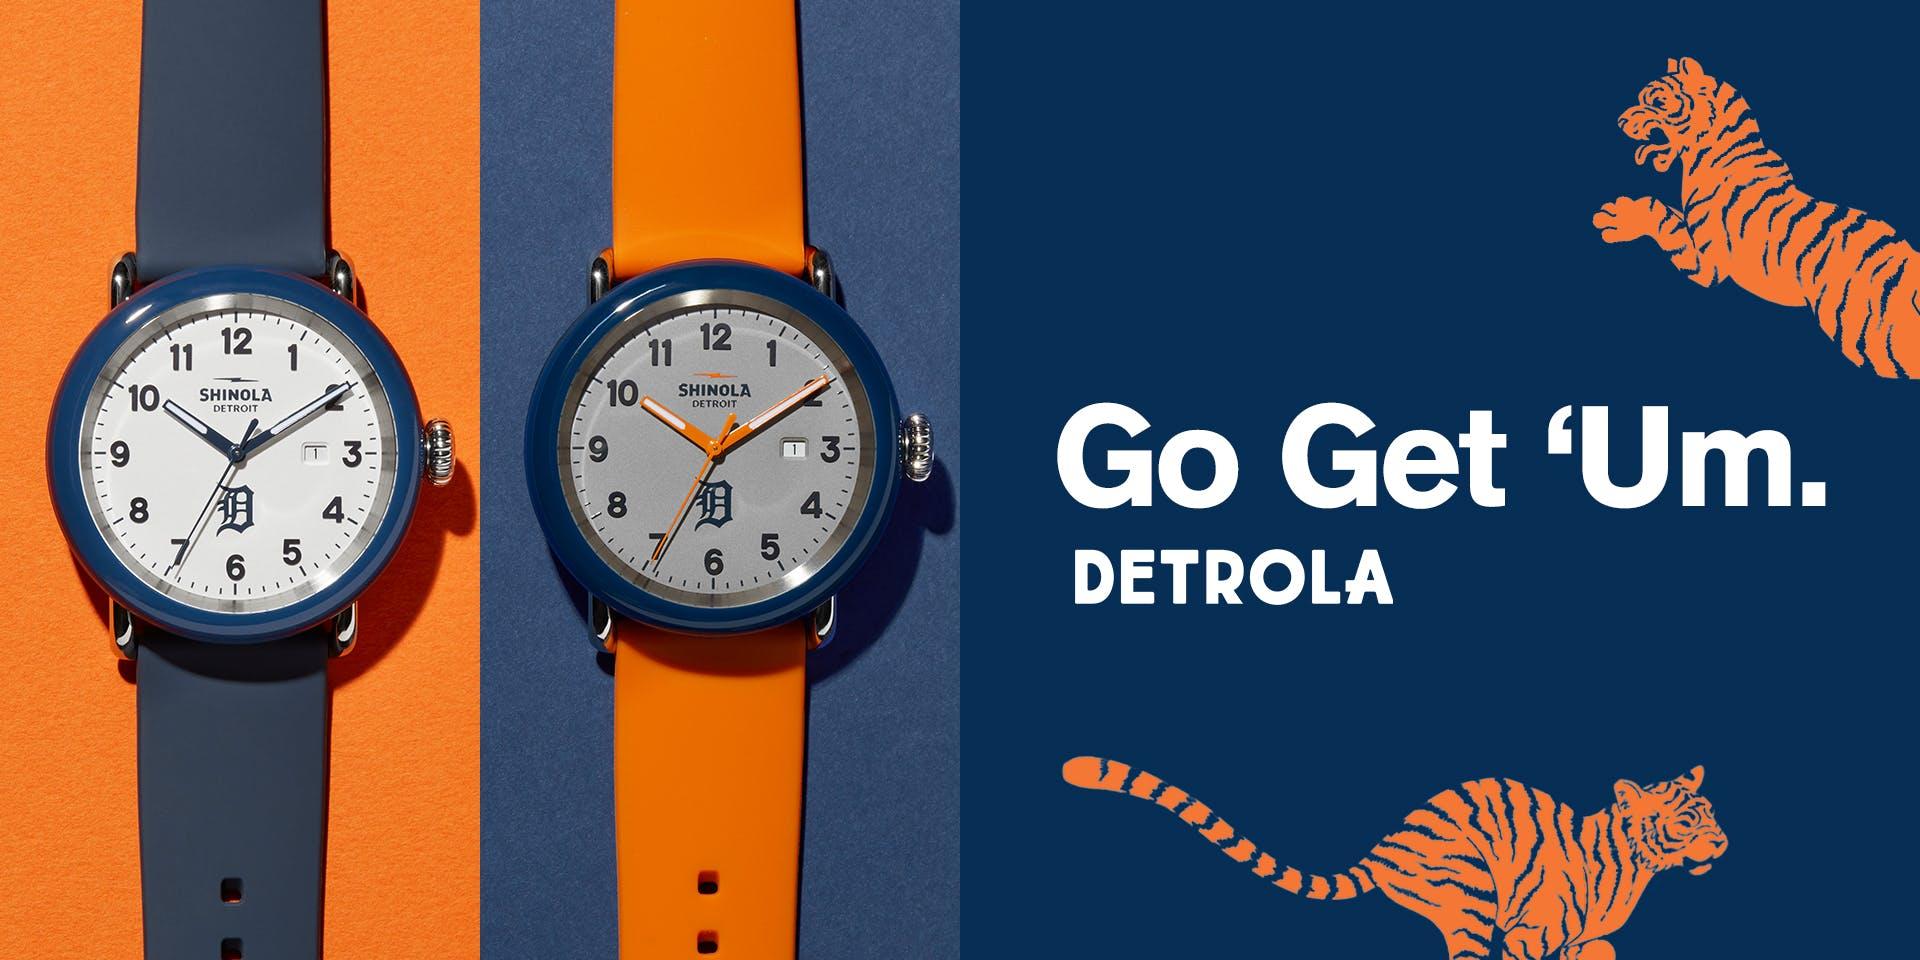 Meet the new Tigers Detrola